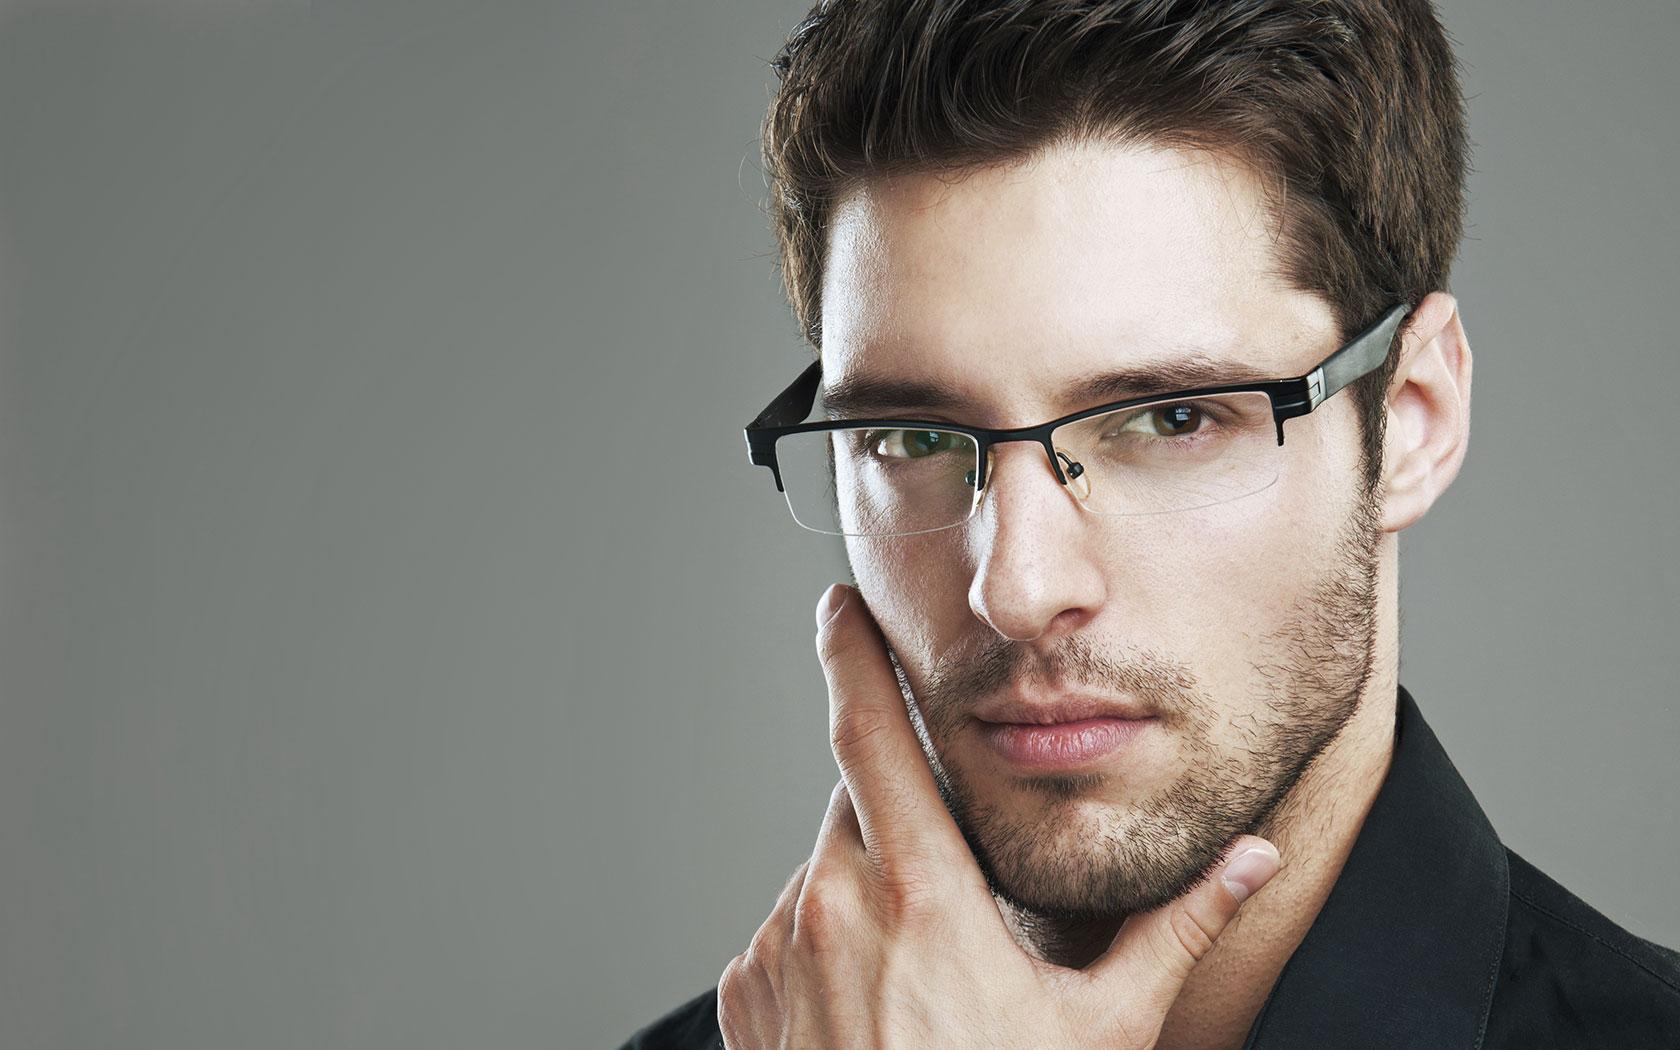 Latest Trends In Men s Eyeglass Frames : Dorky No More: Looking Sharp Means Wearing Eyeglasses ...